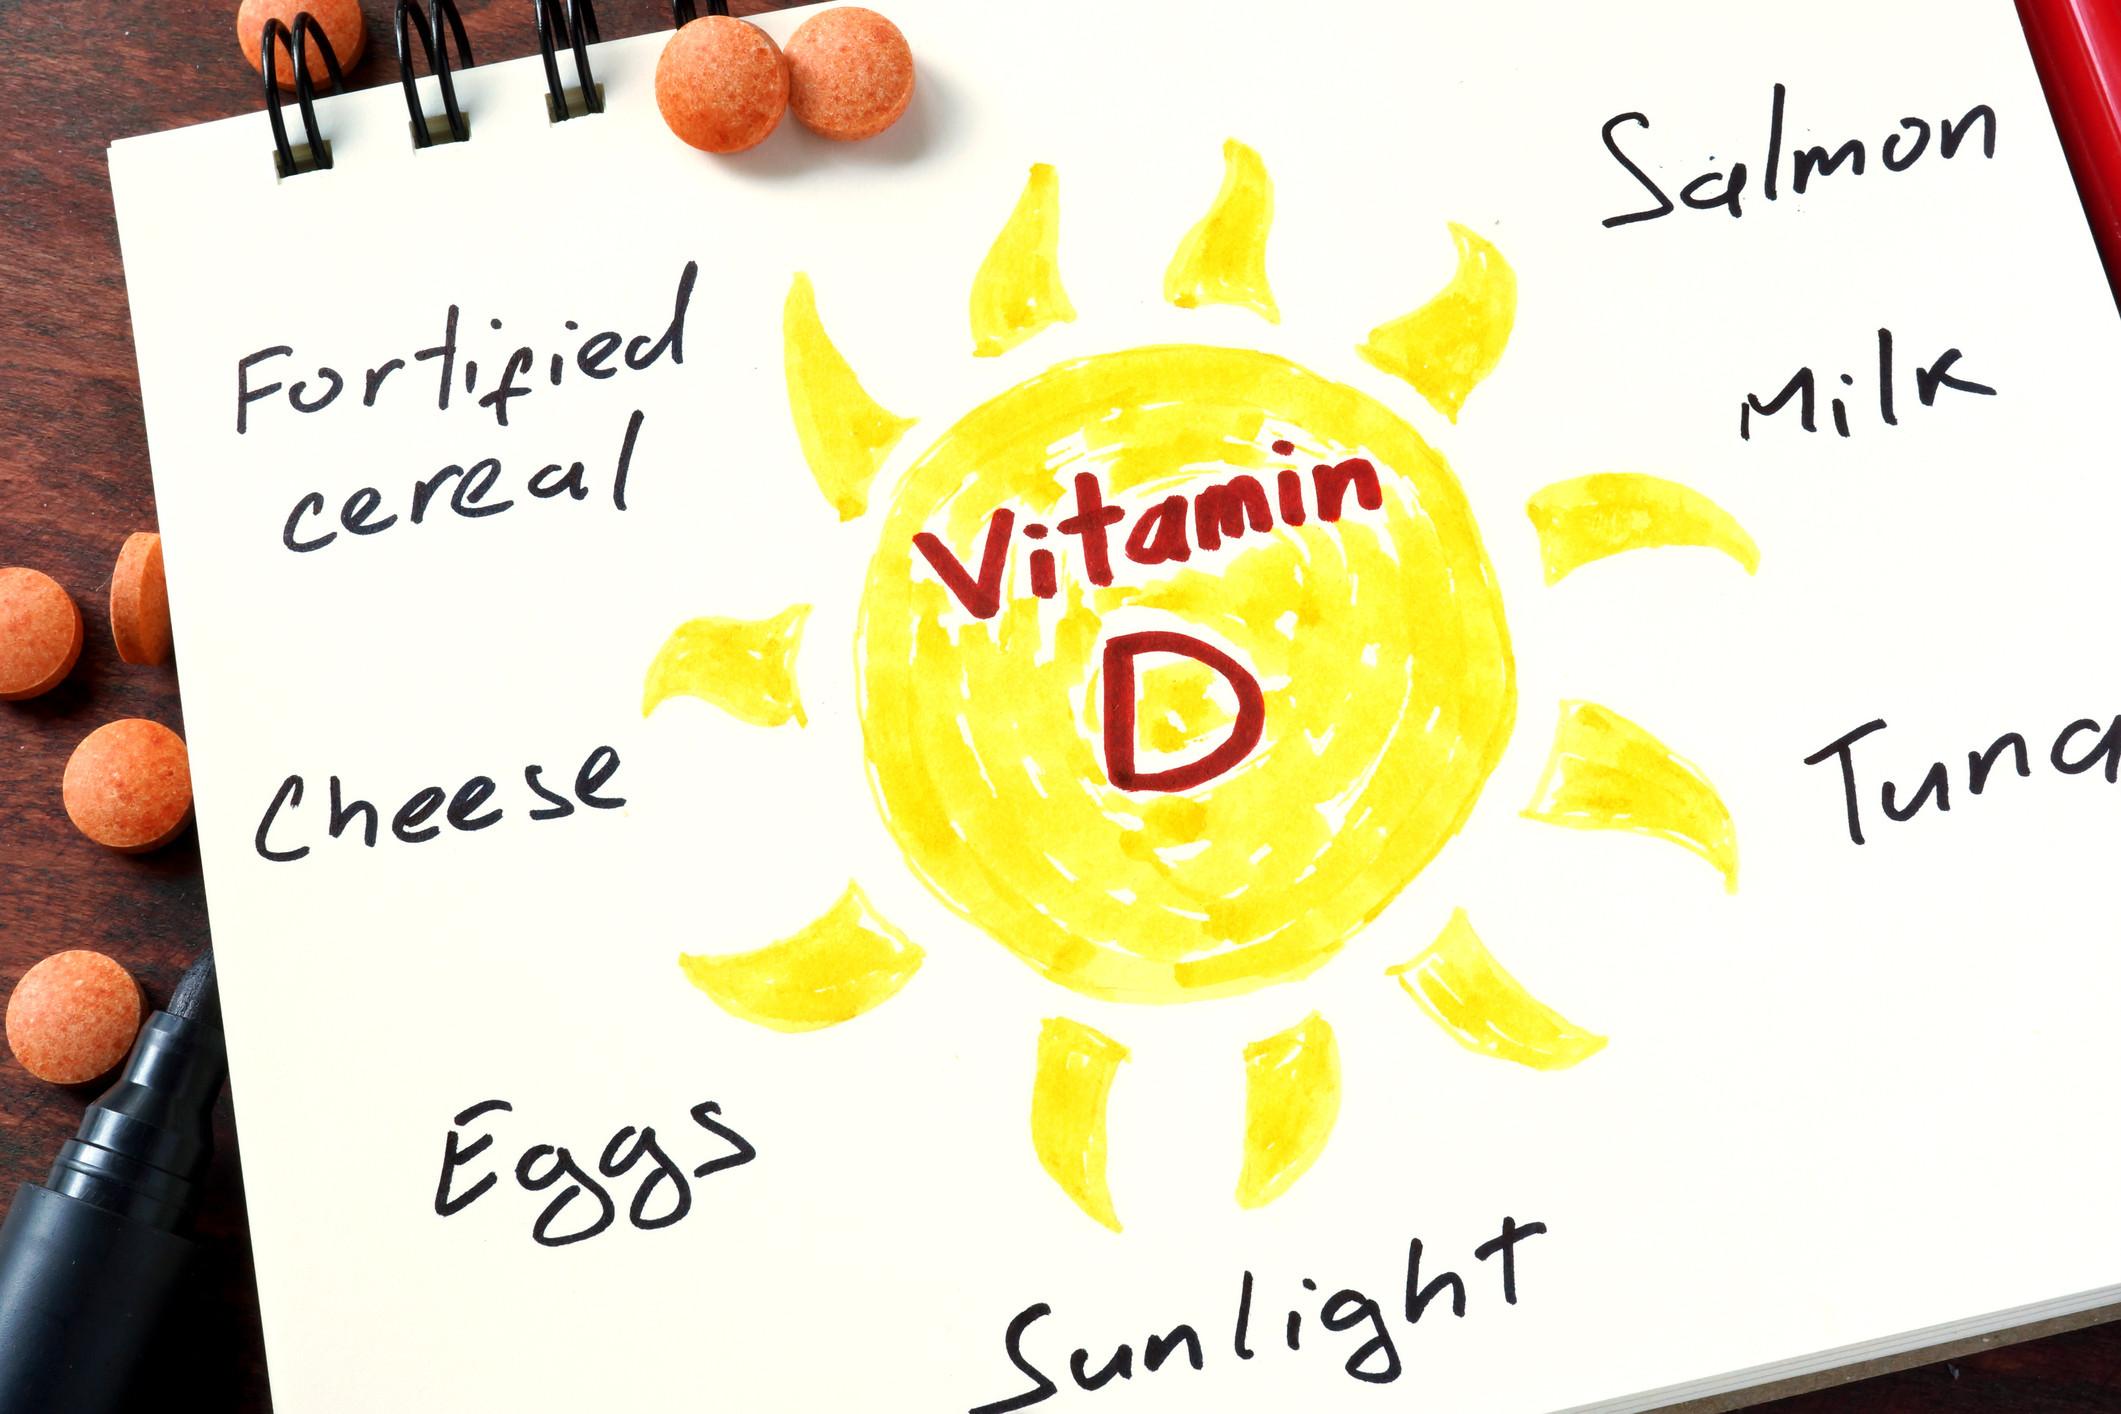 Berjuta Manfaat Dari Vitamin D Dan Mudah Didapatkan